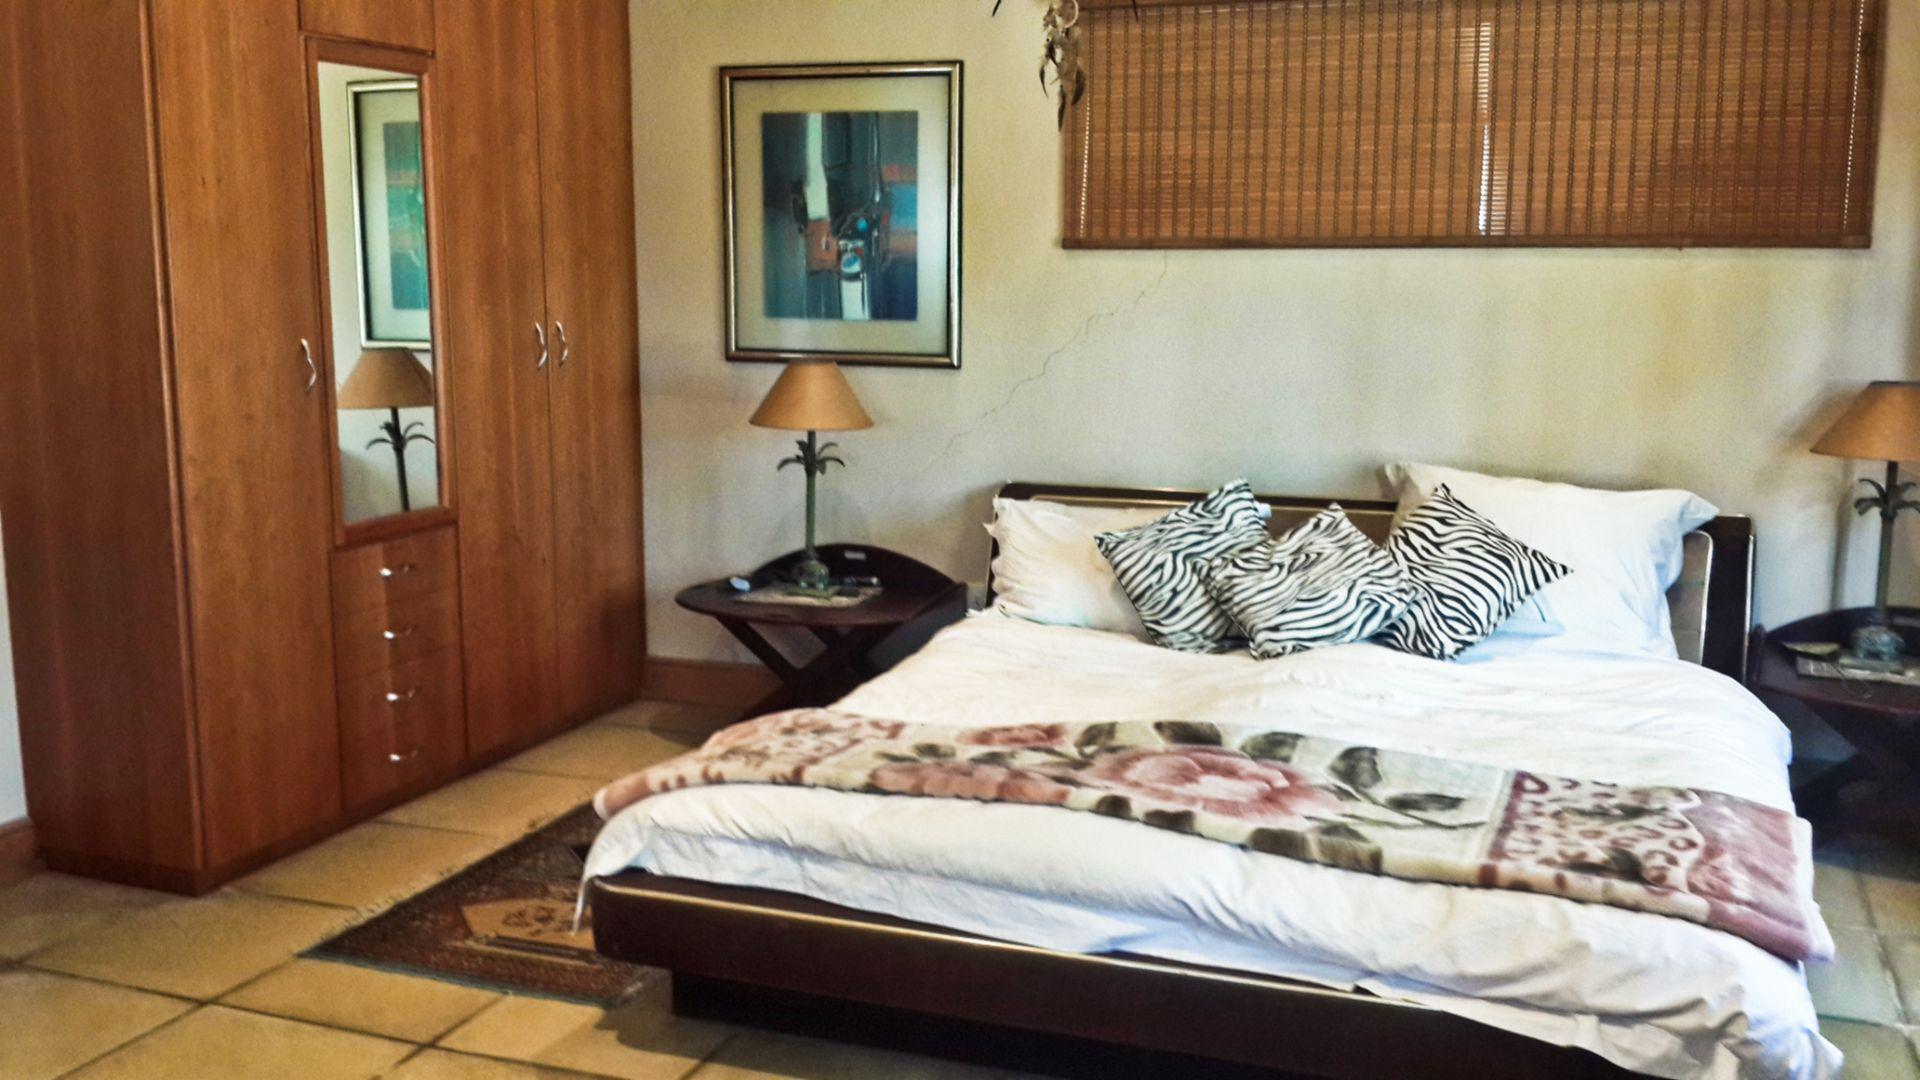 Bedroom Airb&b.jpg